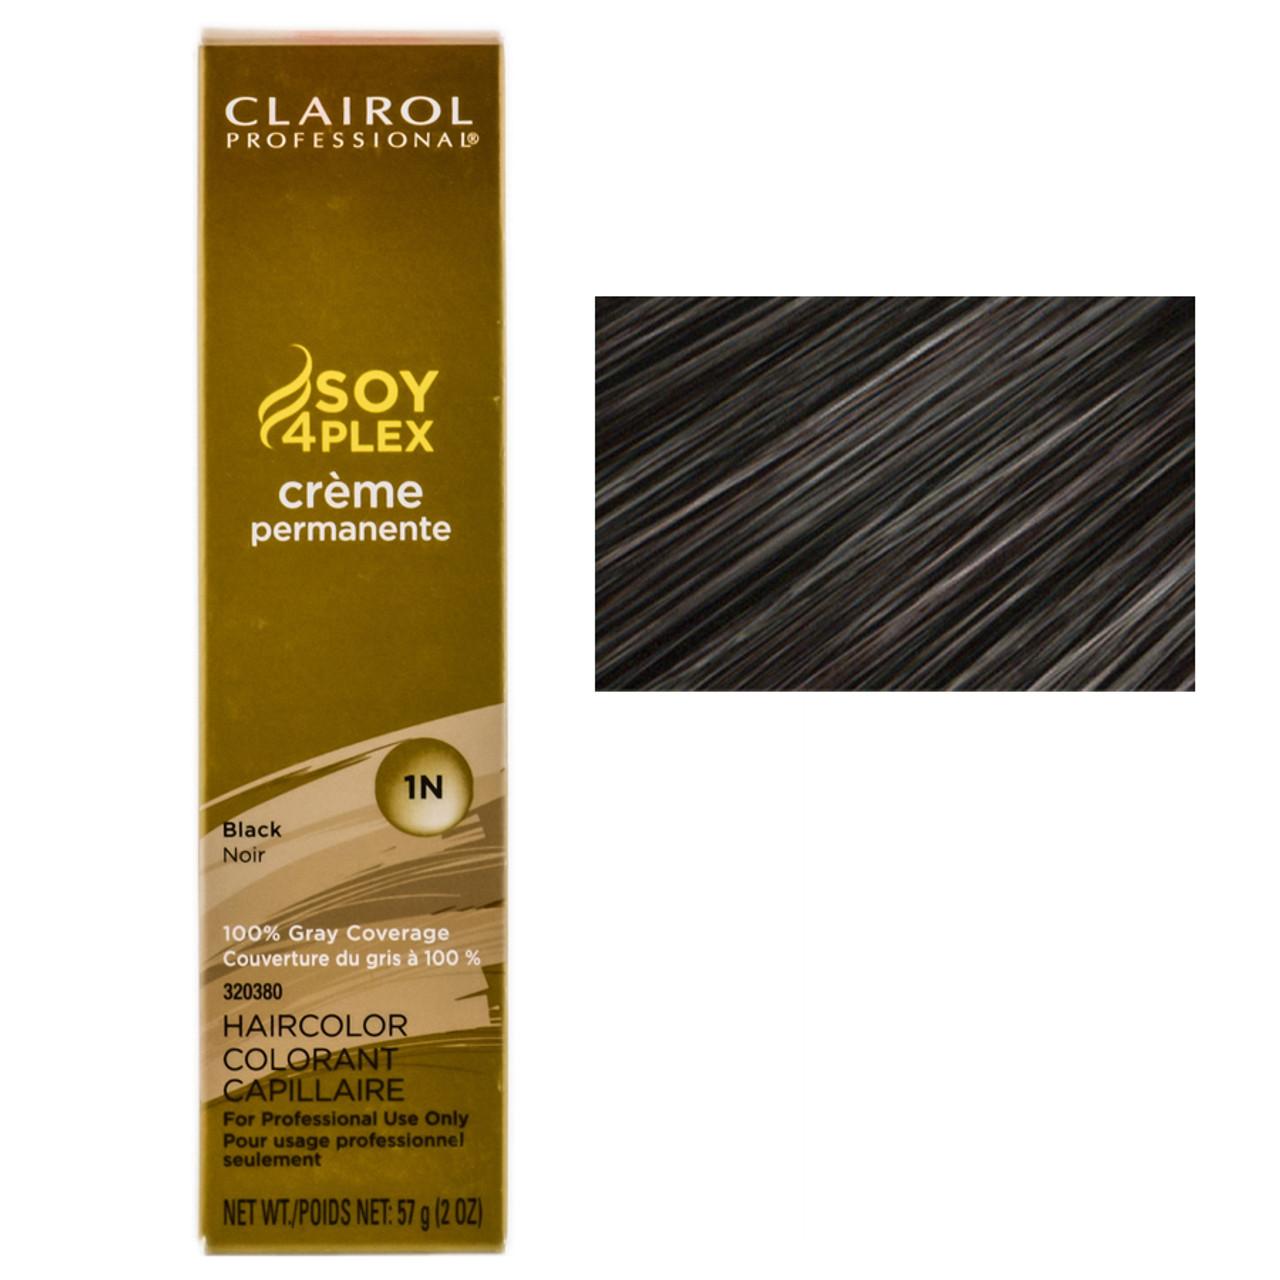 Clairol Professional Creme Permanente Hair Color Sleekshop